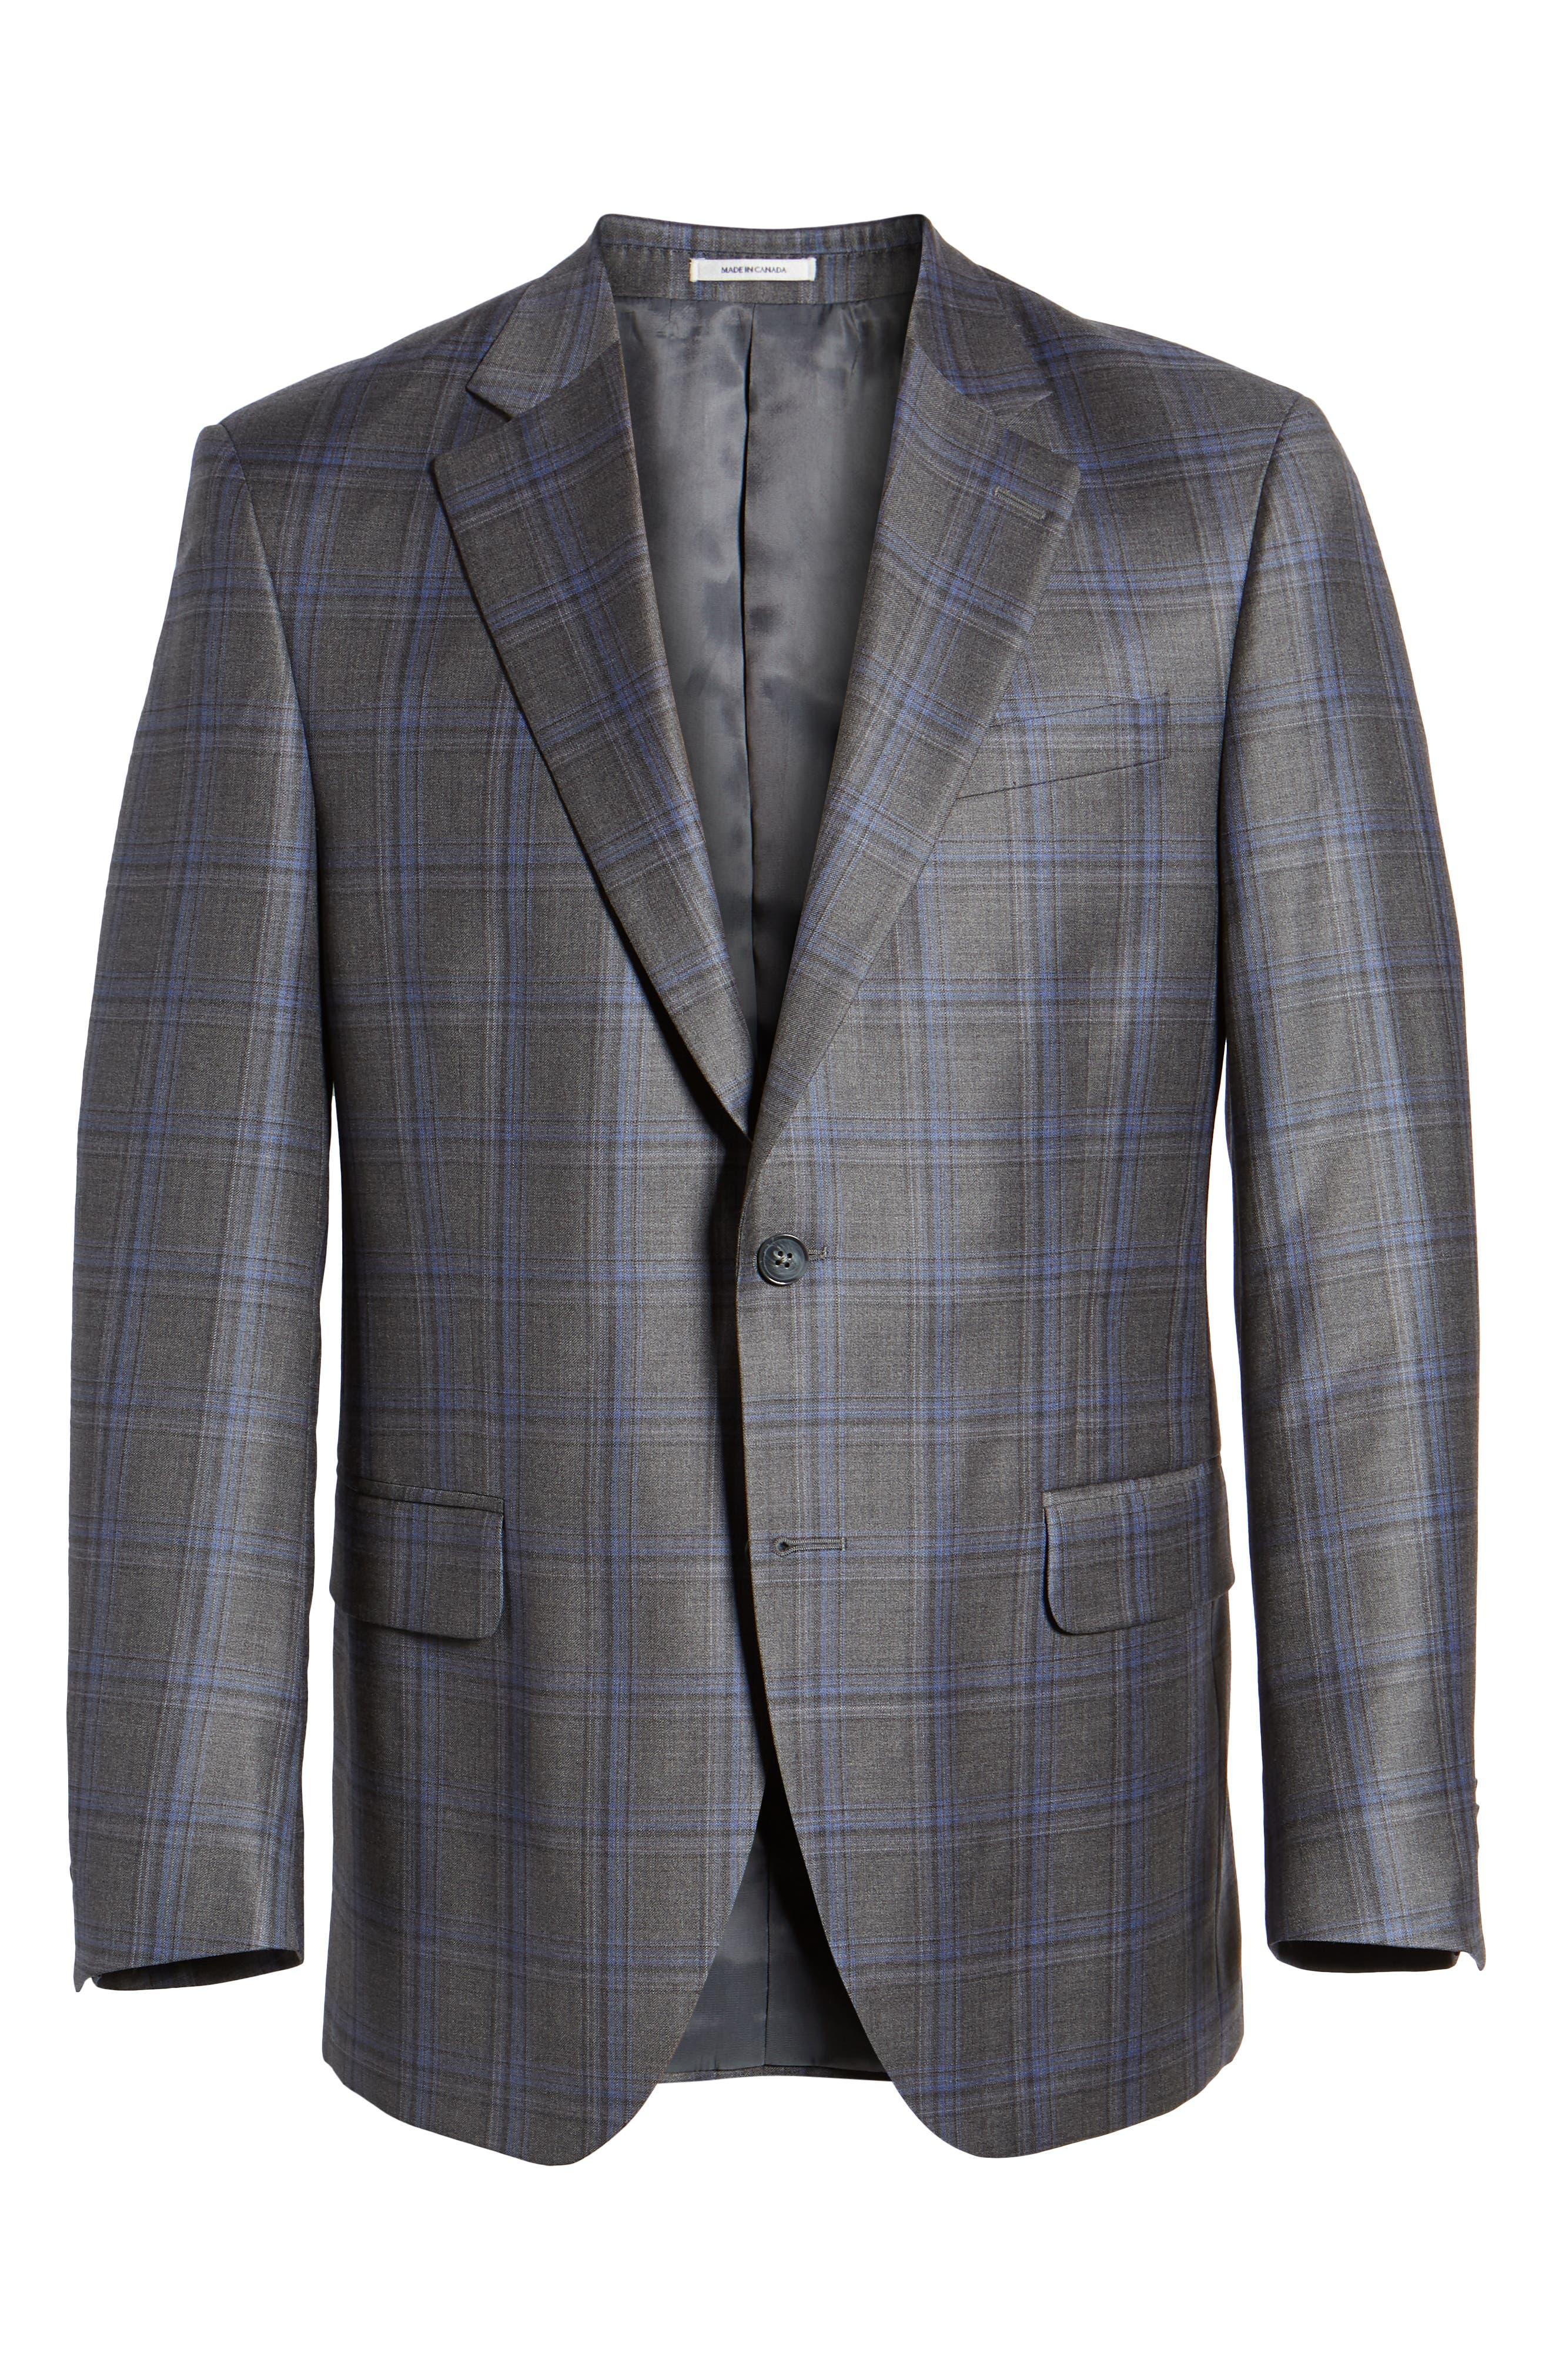 PETER MILLAR, Classic Fit Grey Plaid Sport Coat, Alternate thumbnail 5, color, GREY